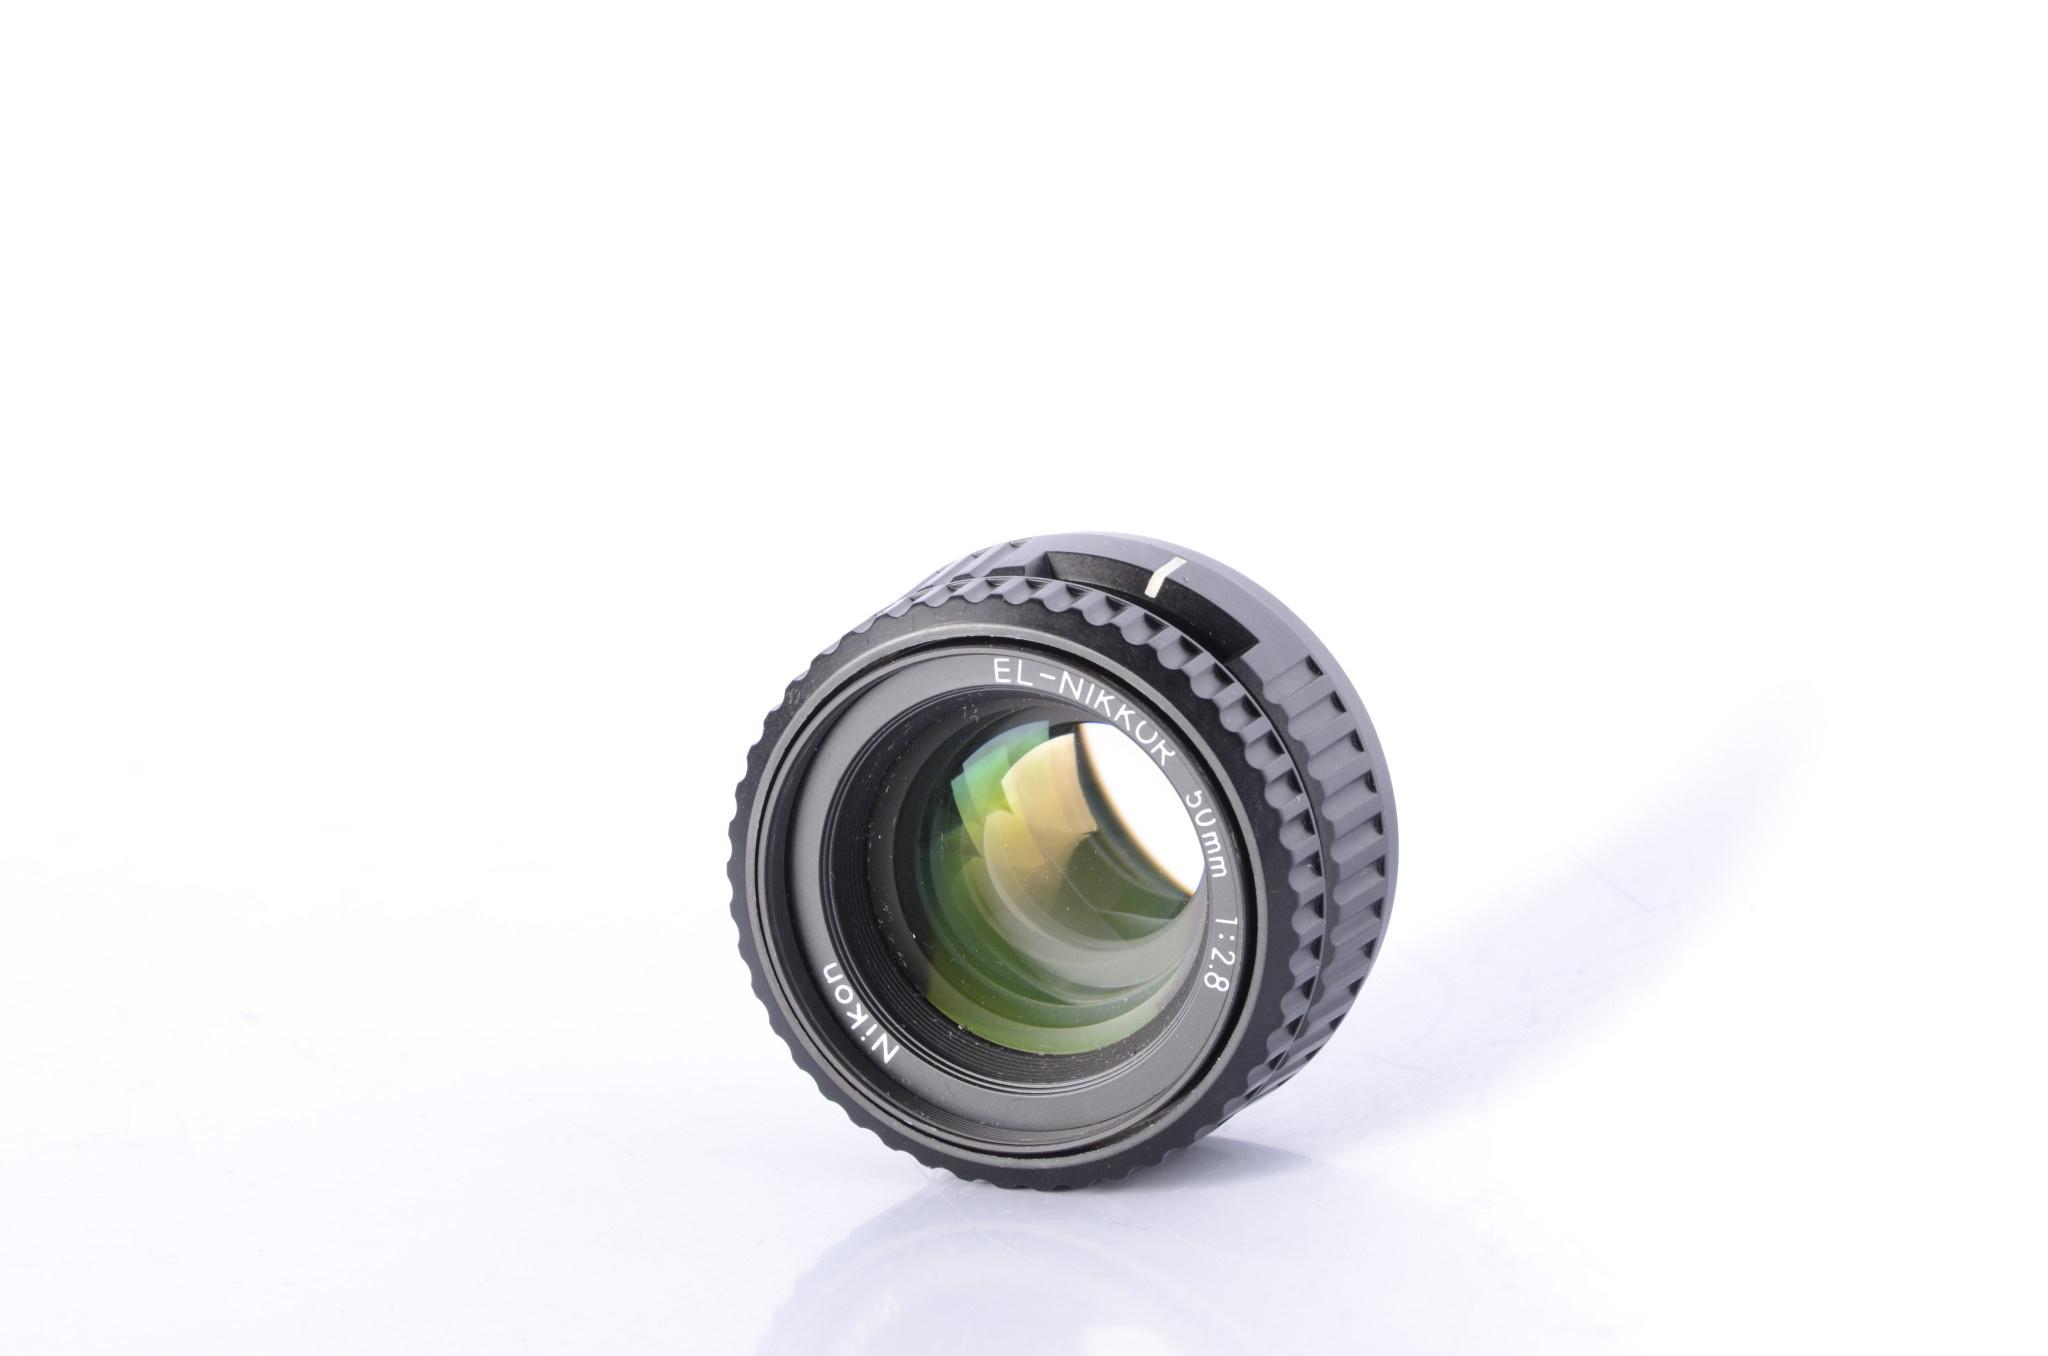 Nikon Nikon El-Nikkor 50mm f/2.8 Enlarger lens